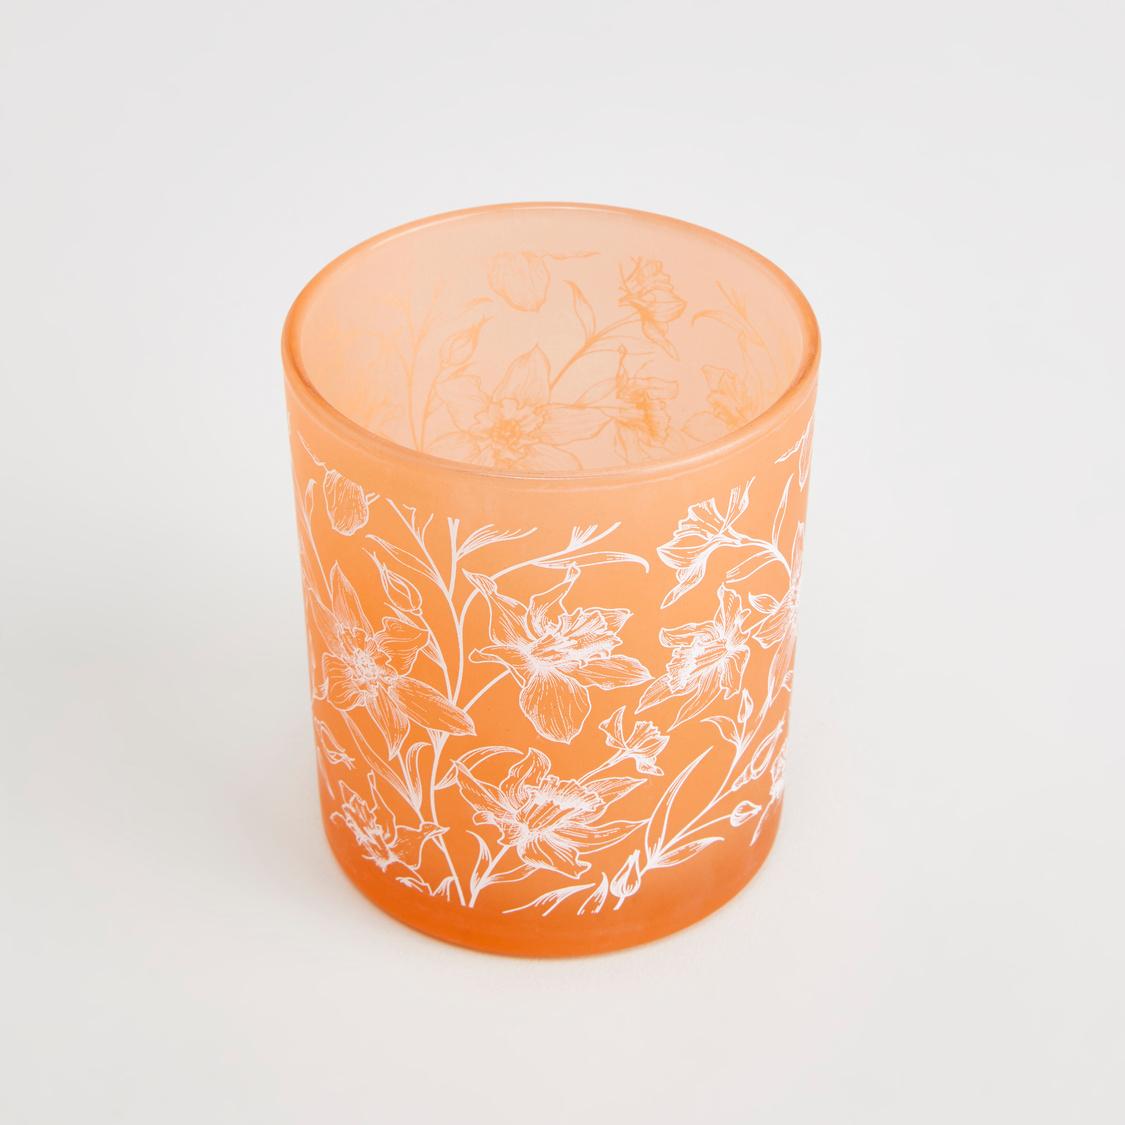 Votive Candle Holder - 9x9x10 cms